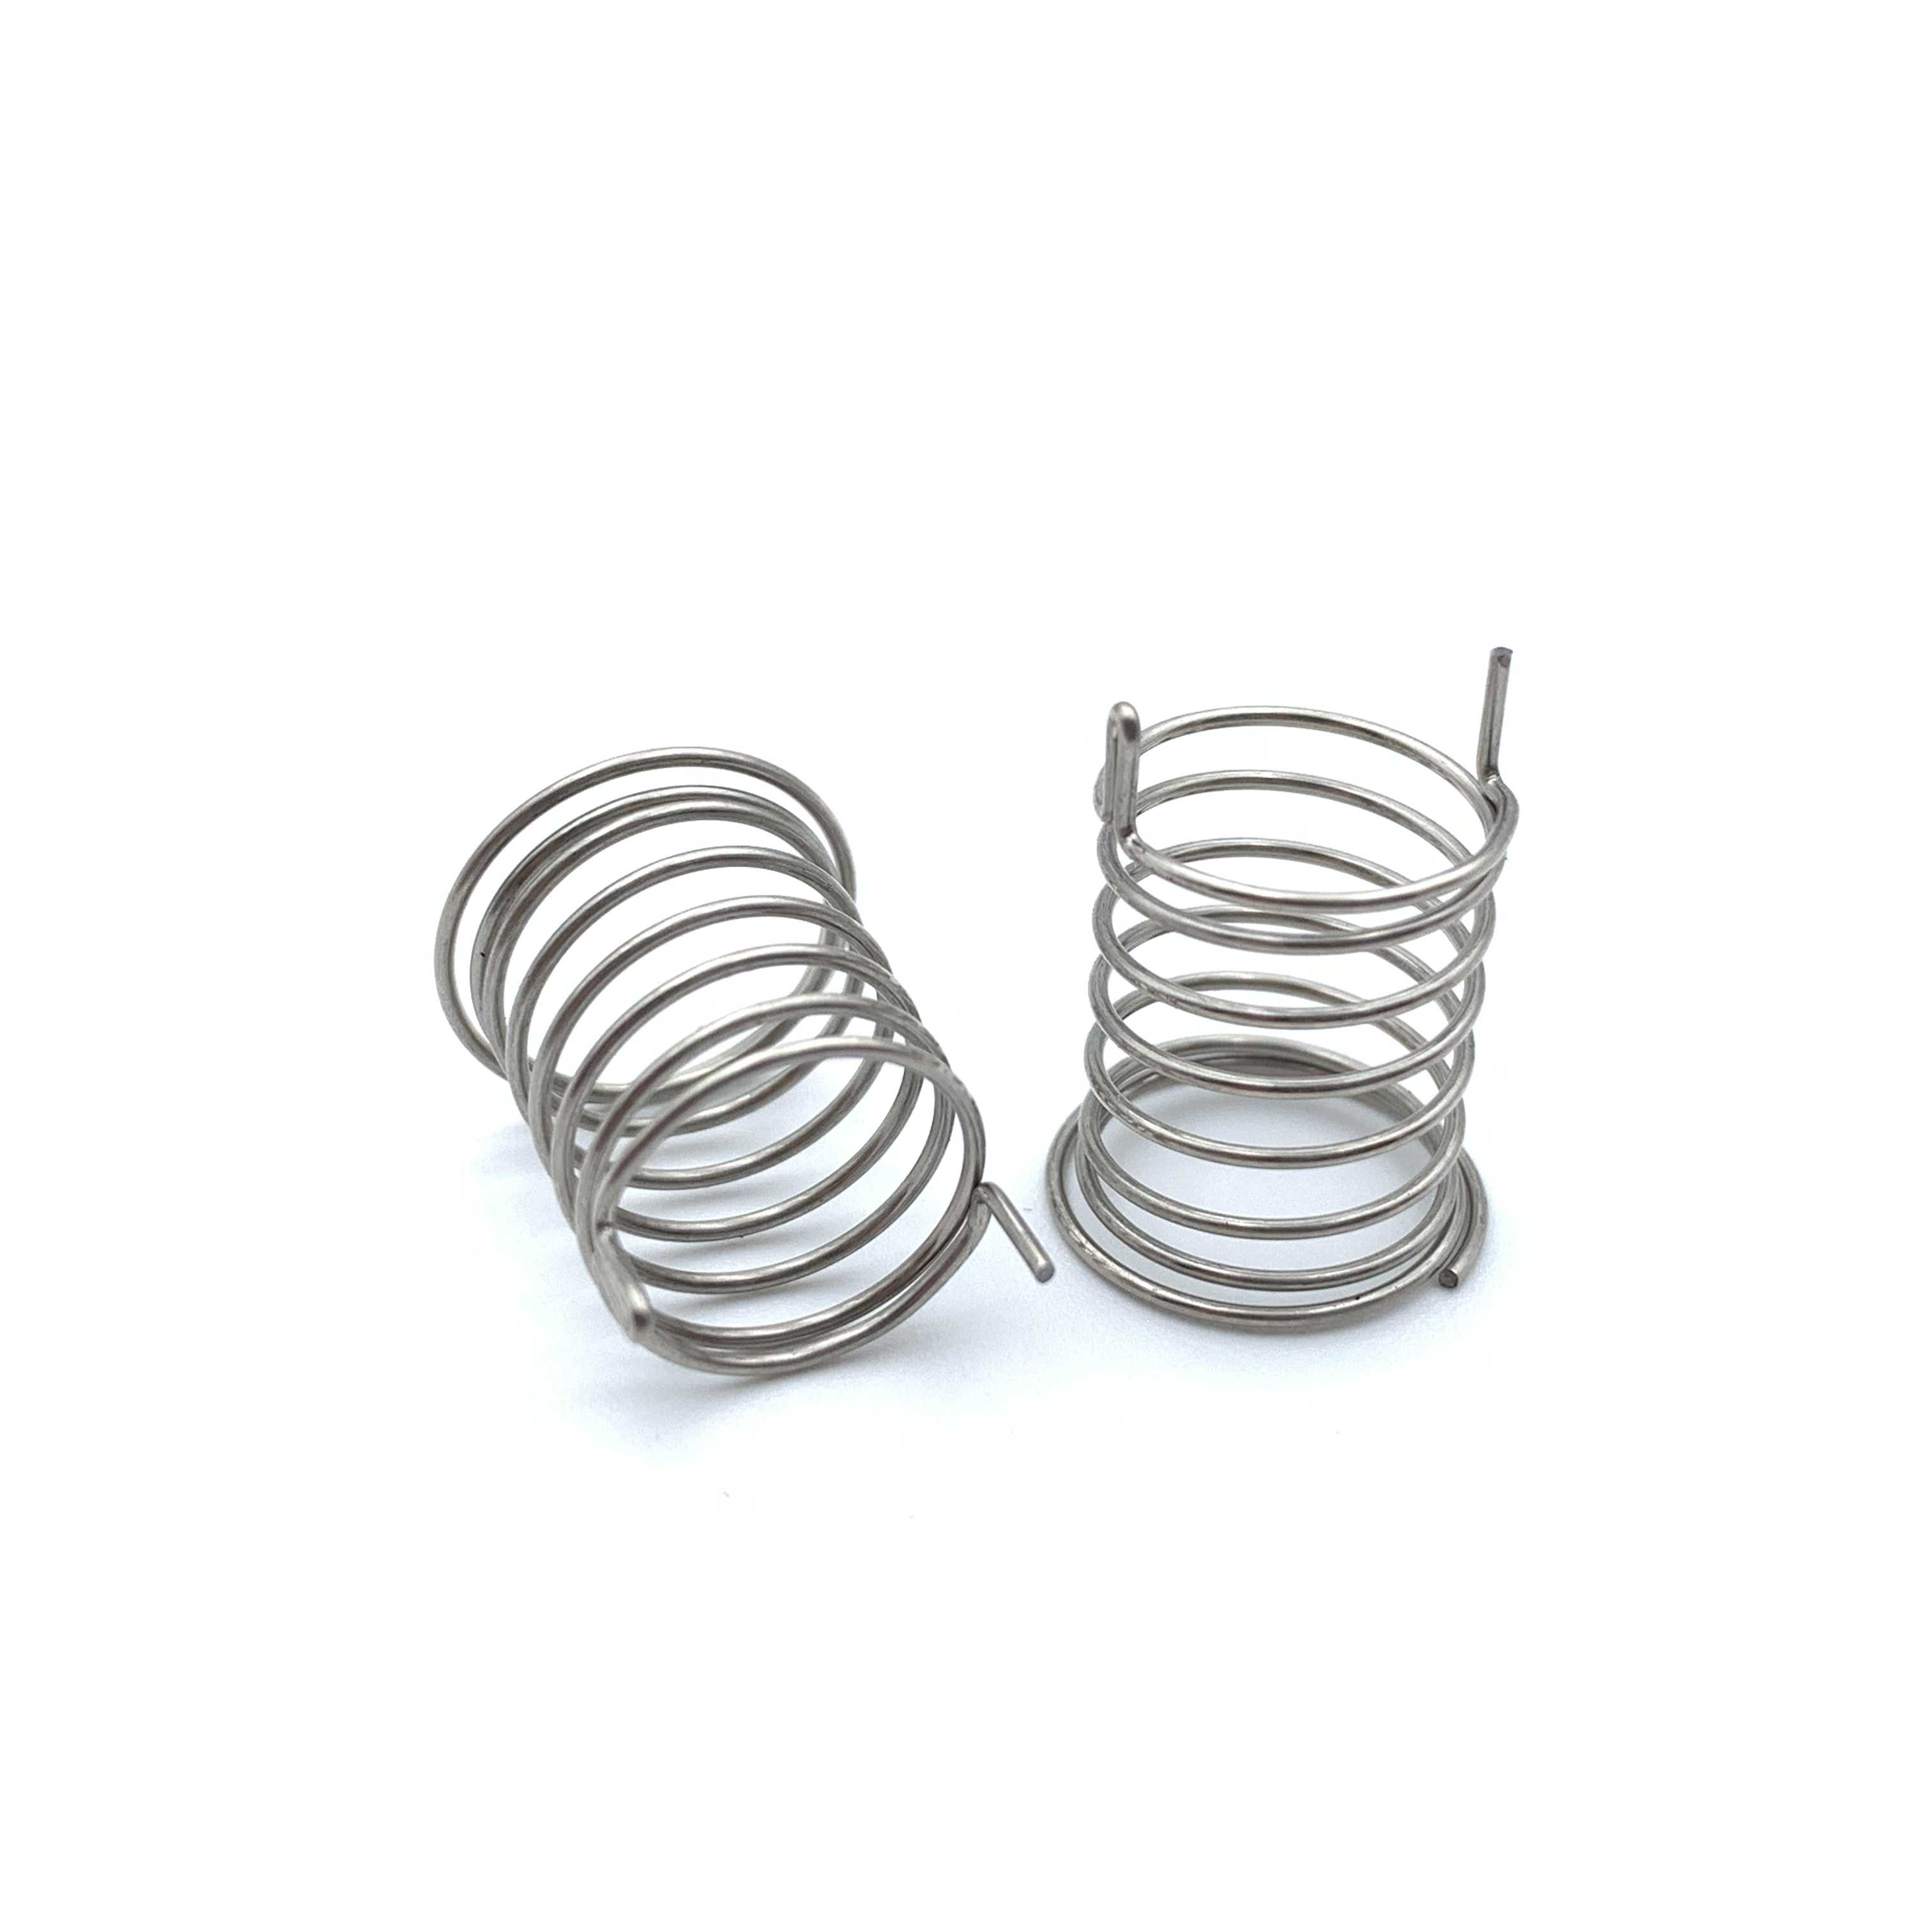 Oem นิกเกิลชุบสแตนเลสสตีลรูปกรวยขนาดเล็ก coil touch ฤดูใบไม้ผลิกับเครื่องแทรก